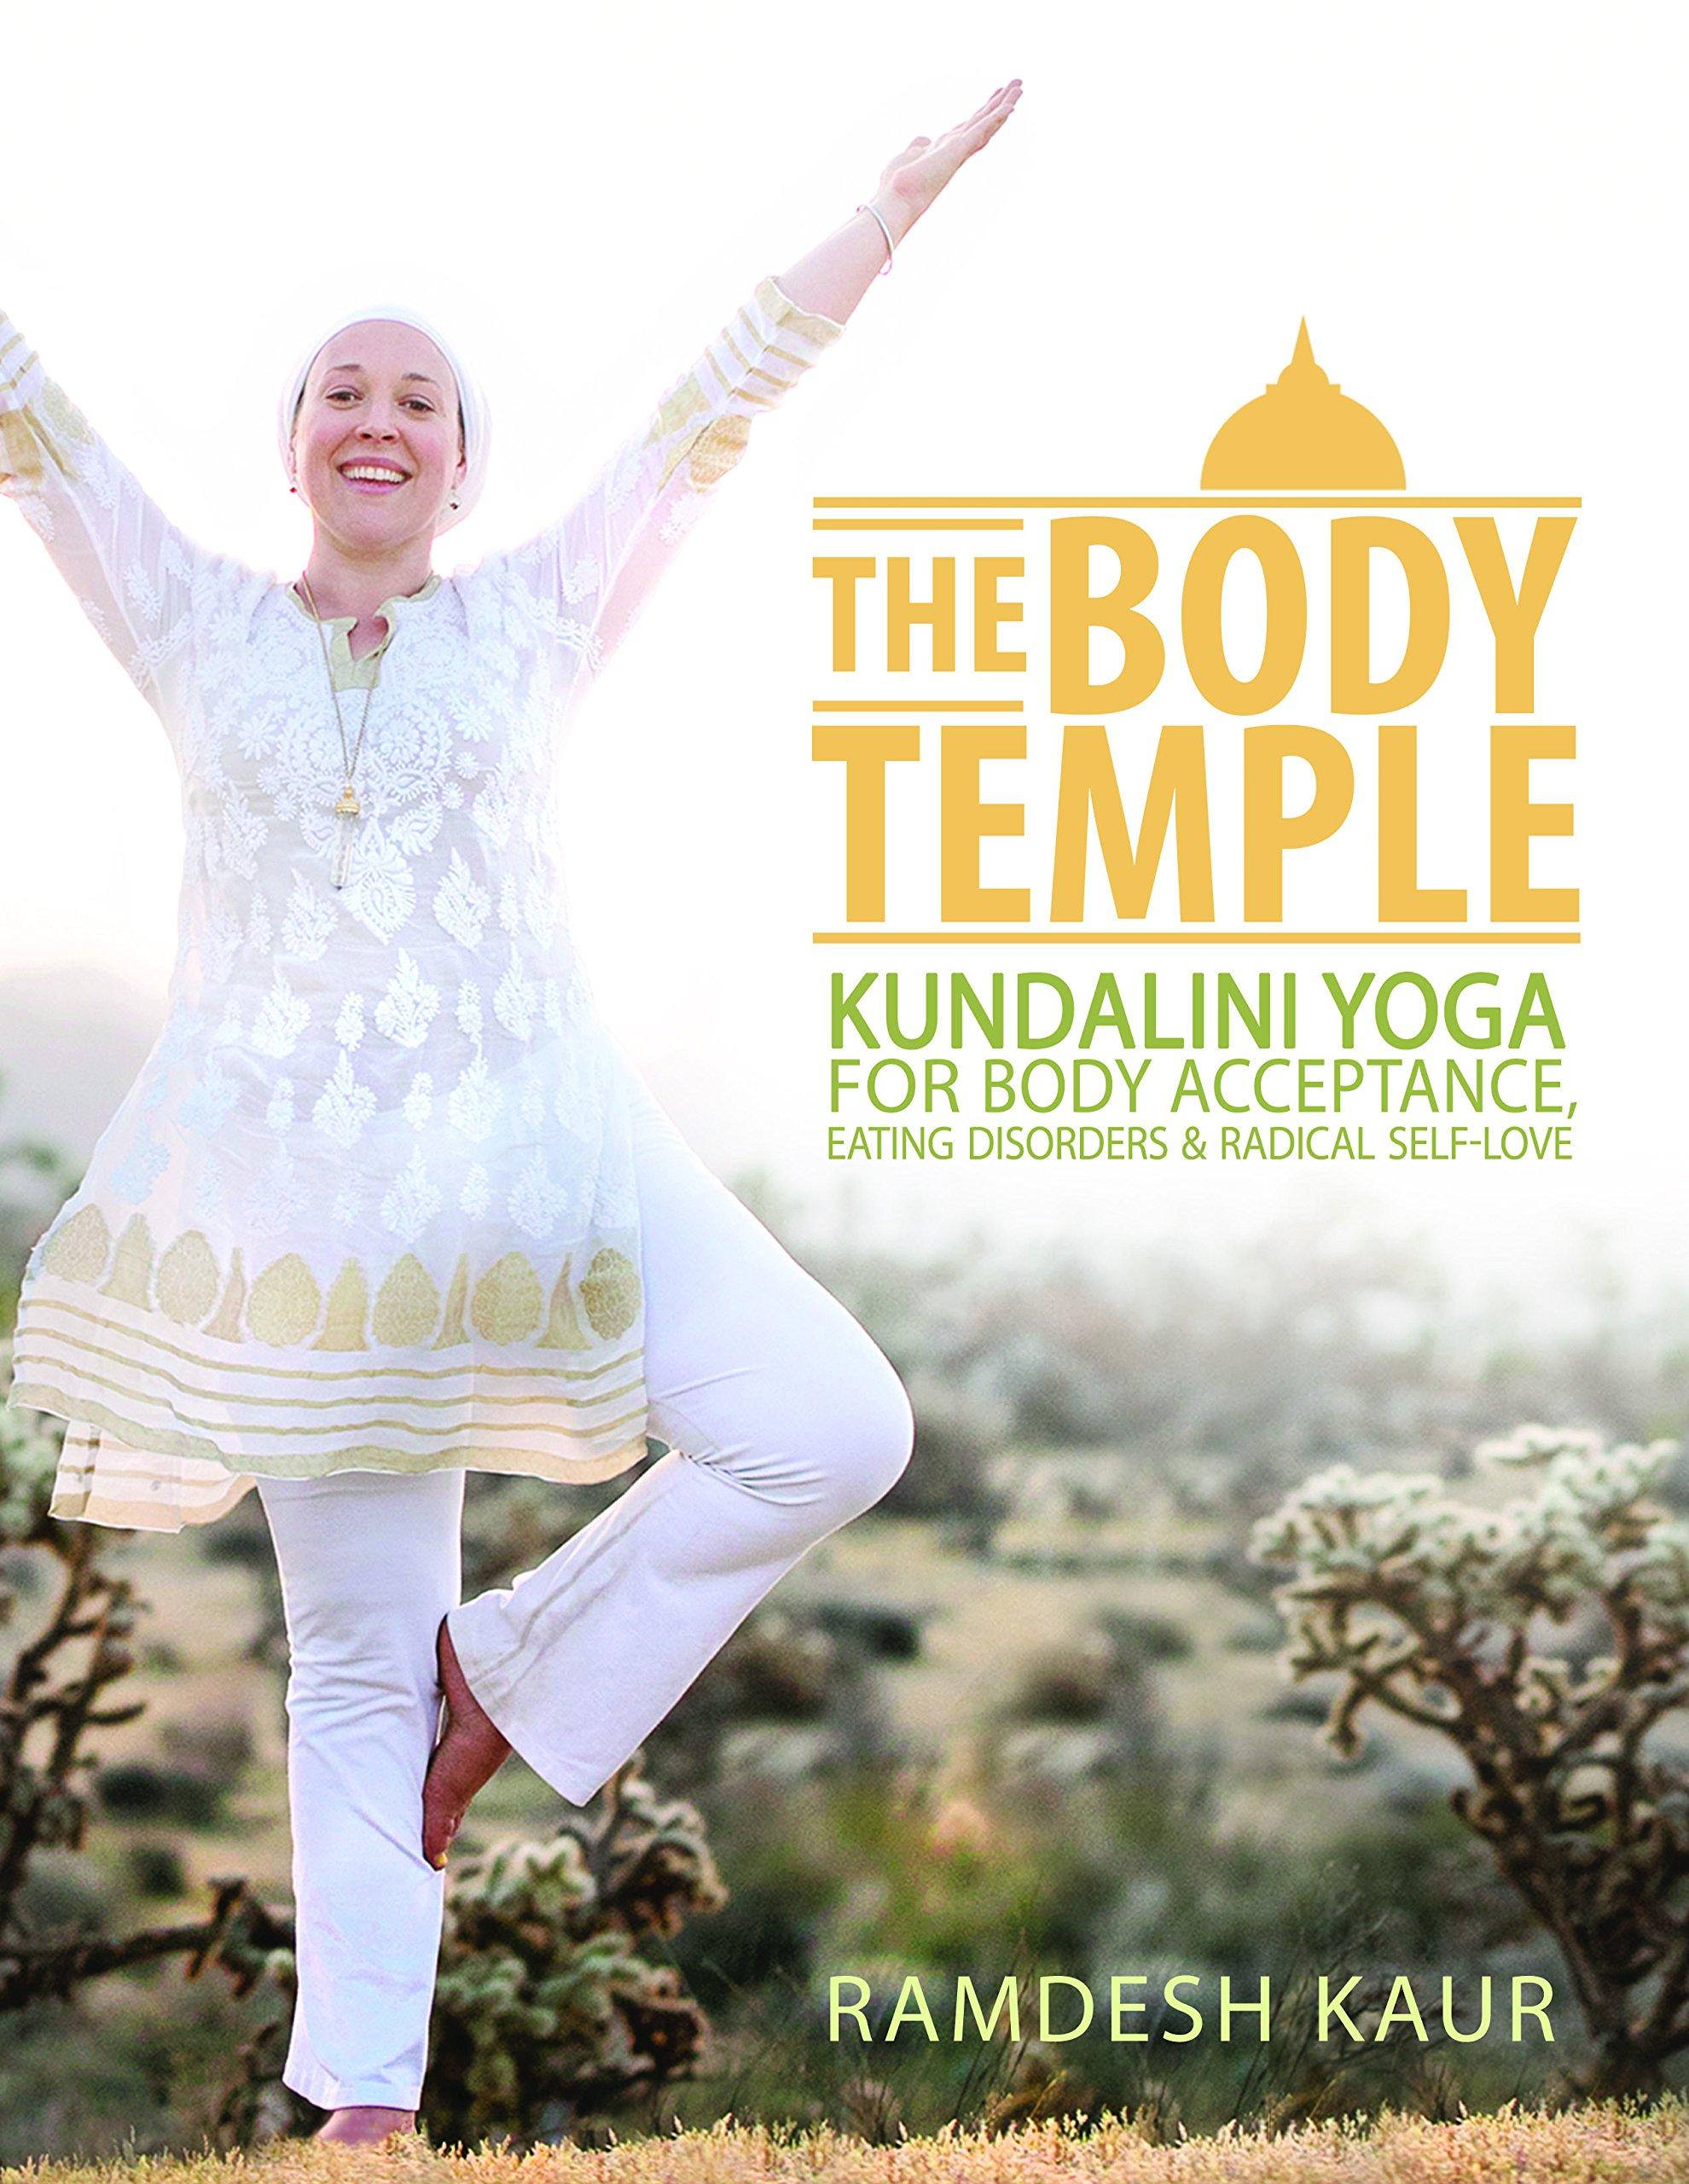 The body temple kundalini yoga for body acceptance eating the body temple kundalini yoga for body acceptance eating disorders radical self love ramdesh ramdesh kaur 9780983569534 amazon books fandeluxe Choice Image